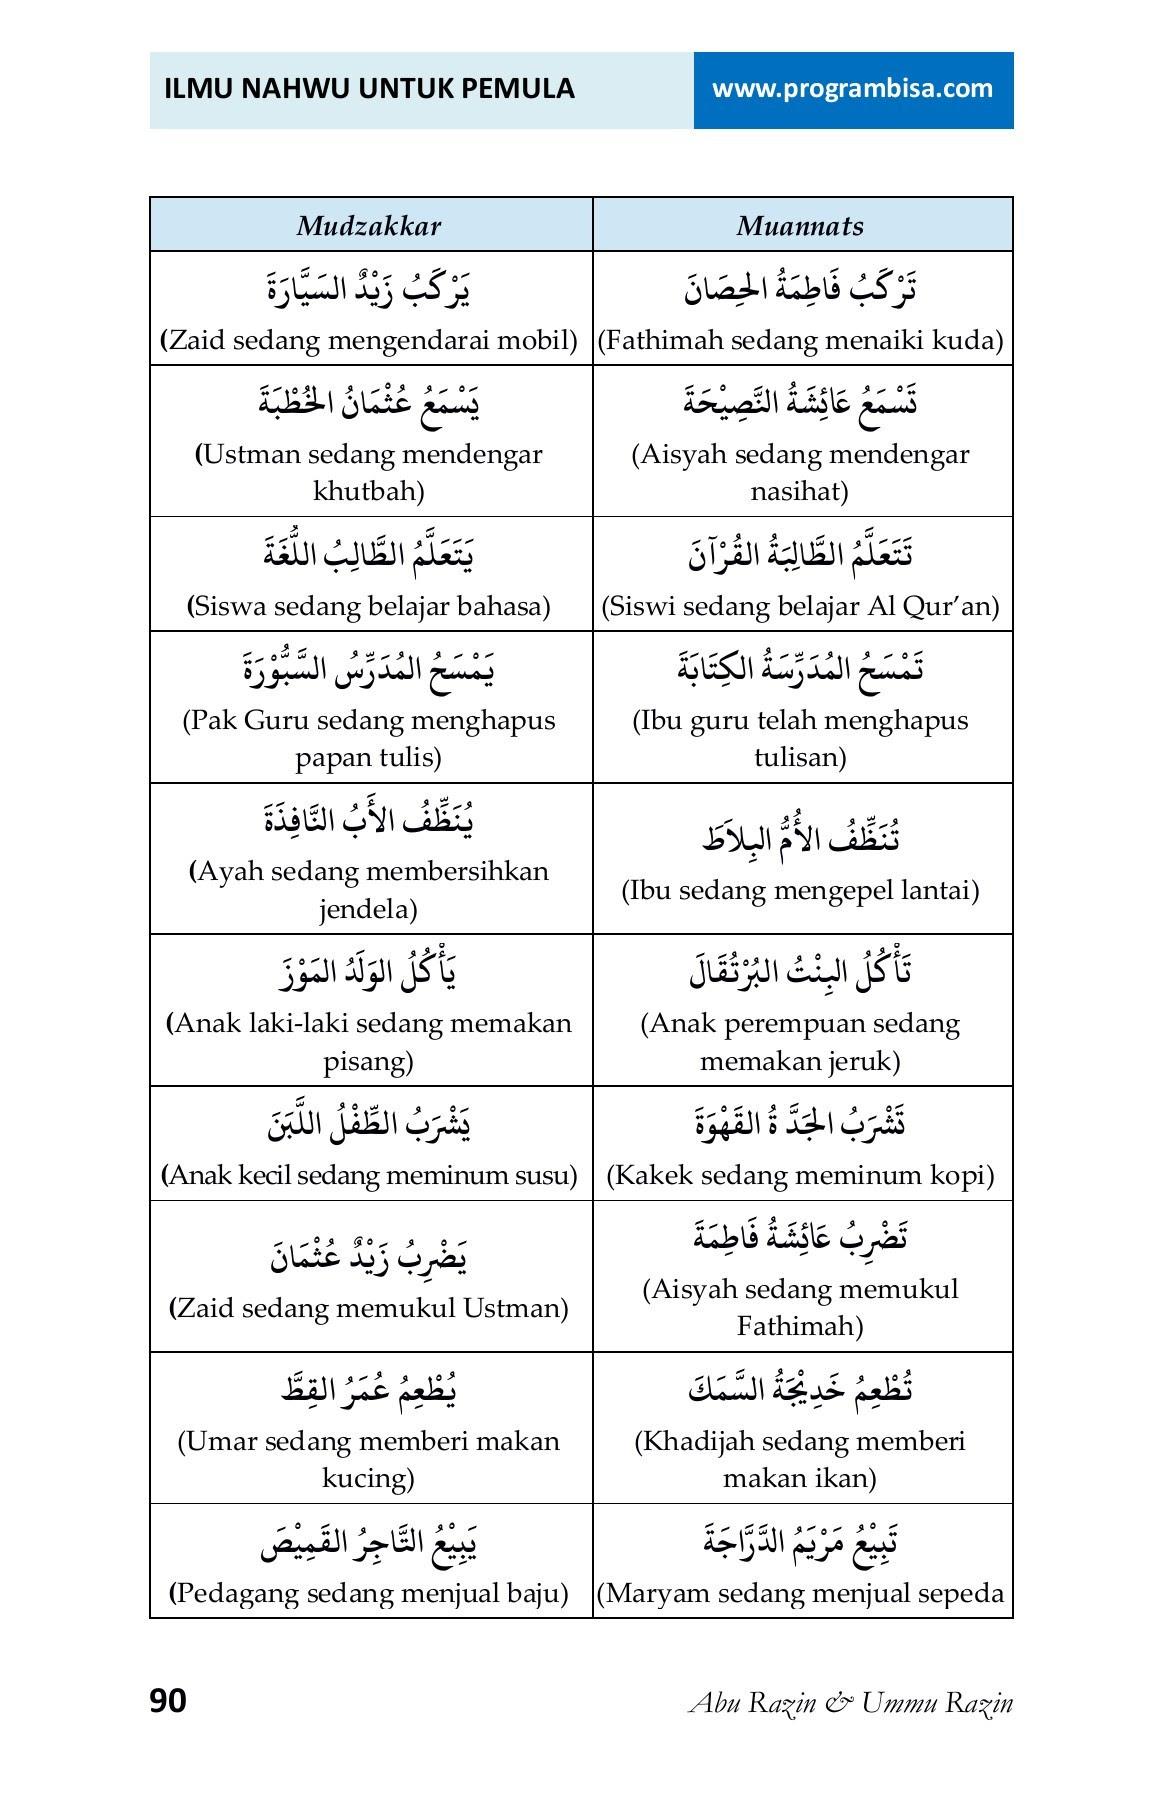 Ebook Ilmu Nahwu Untuk Pemula Rev 01 Pages 101 150 Text Version